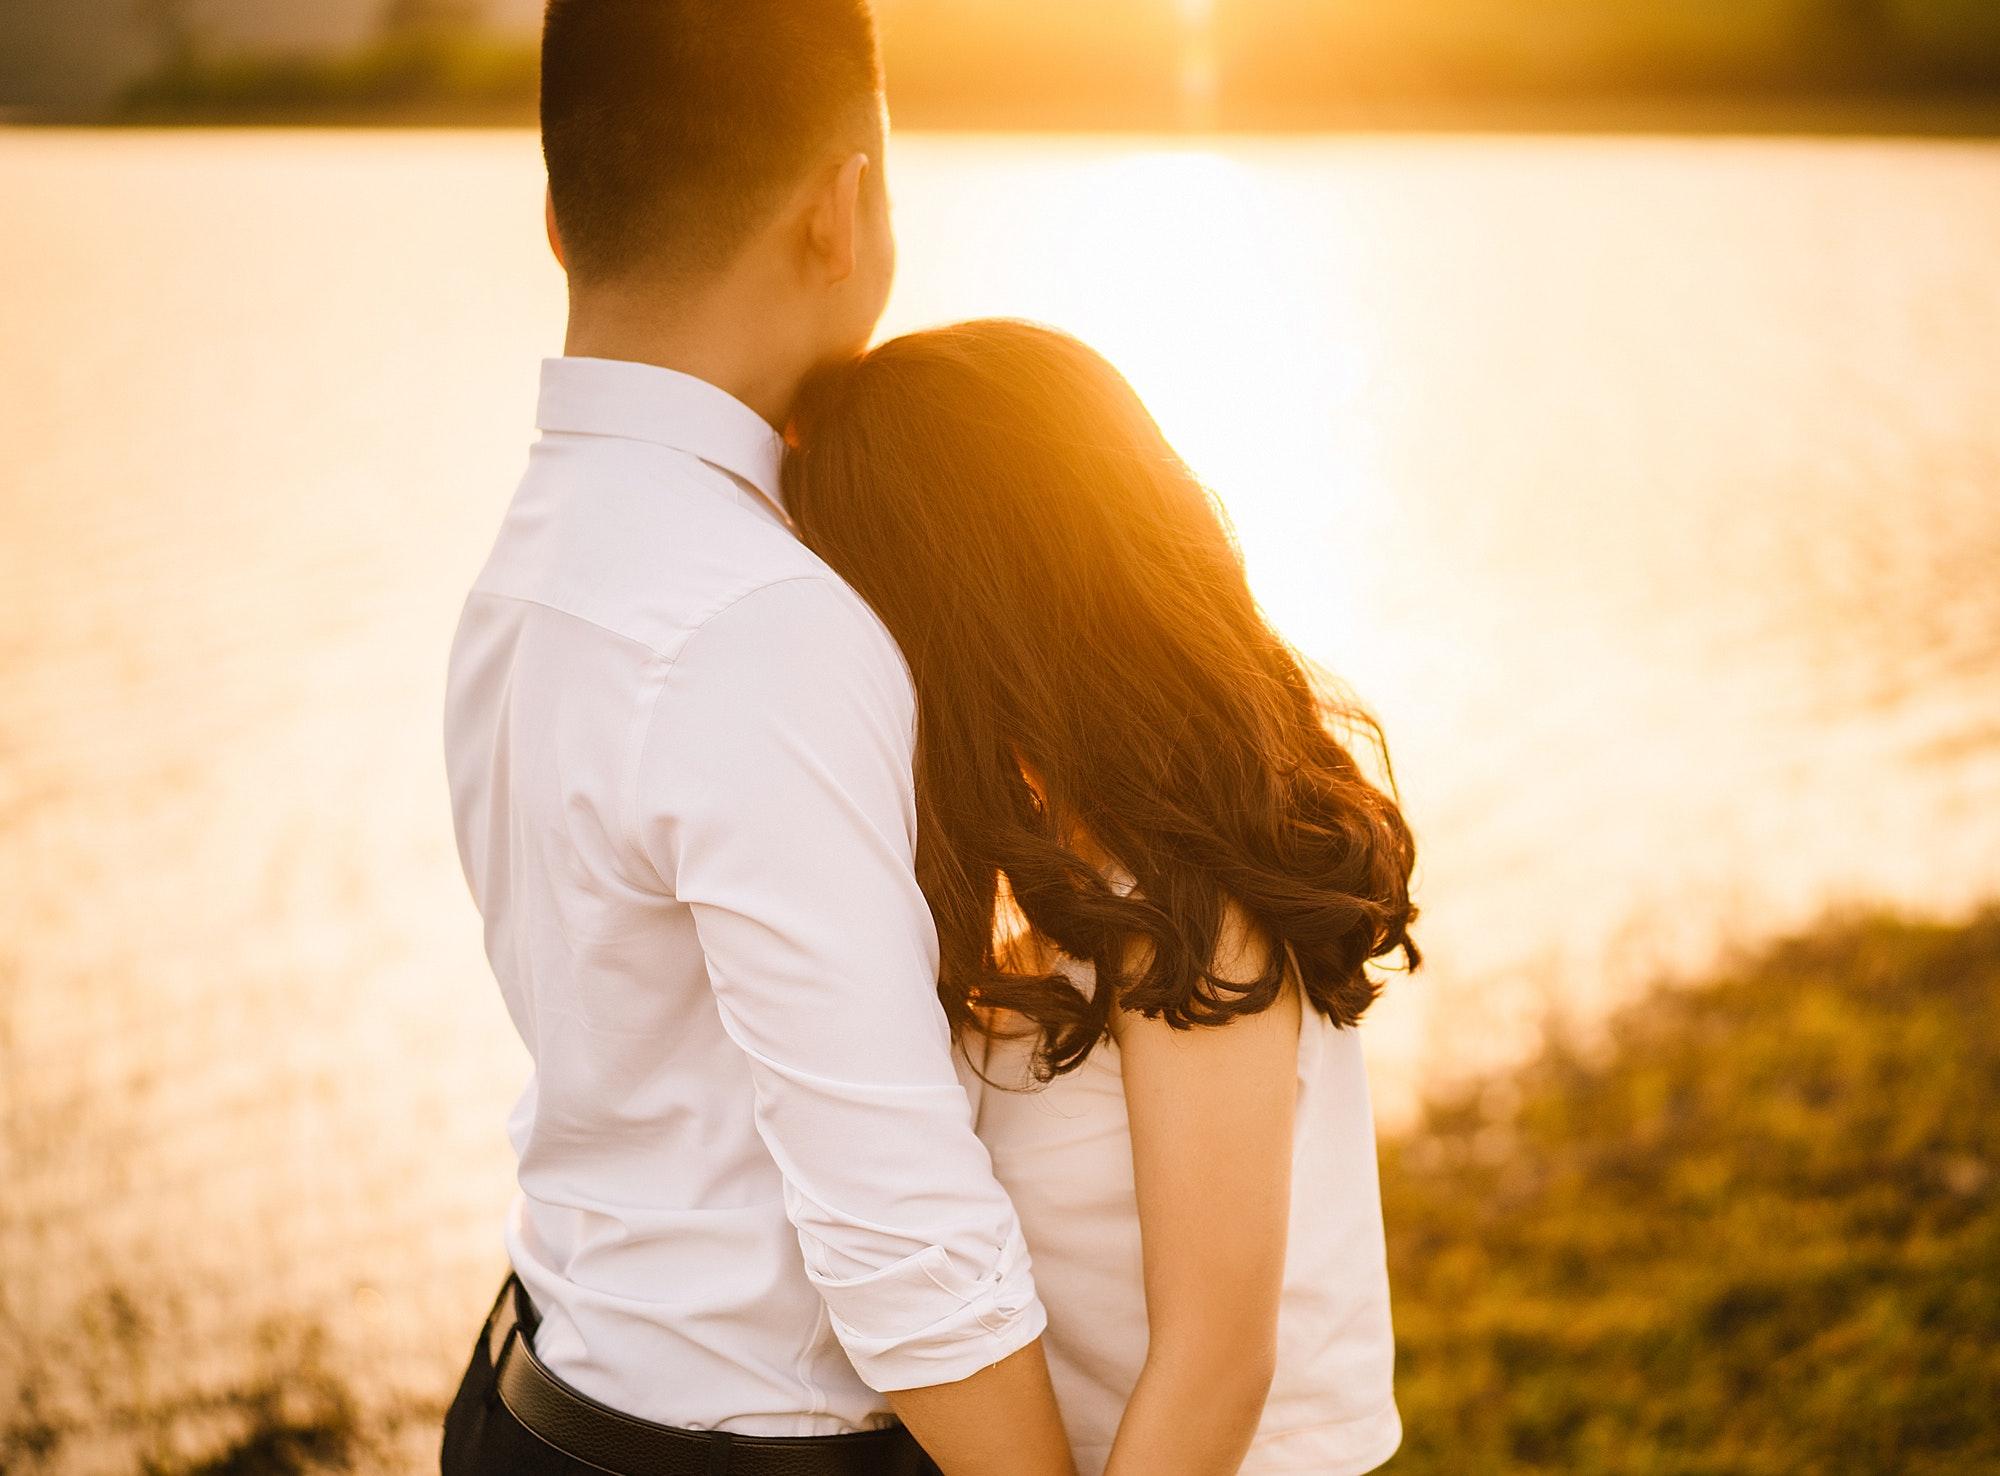 affection-blur-close-up-couple-427547.jpg